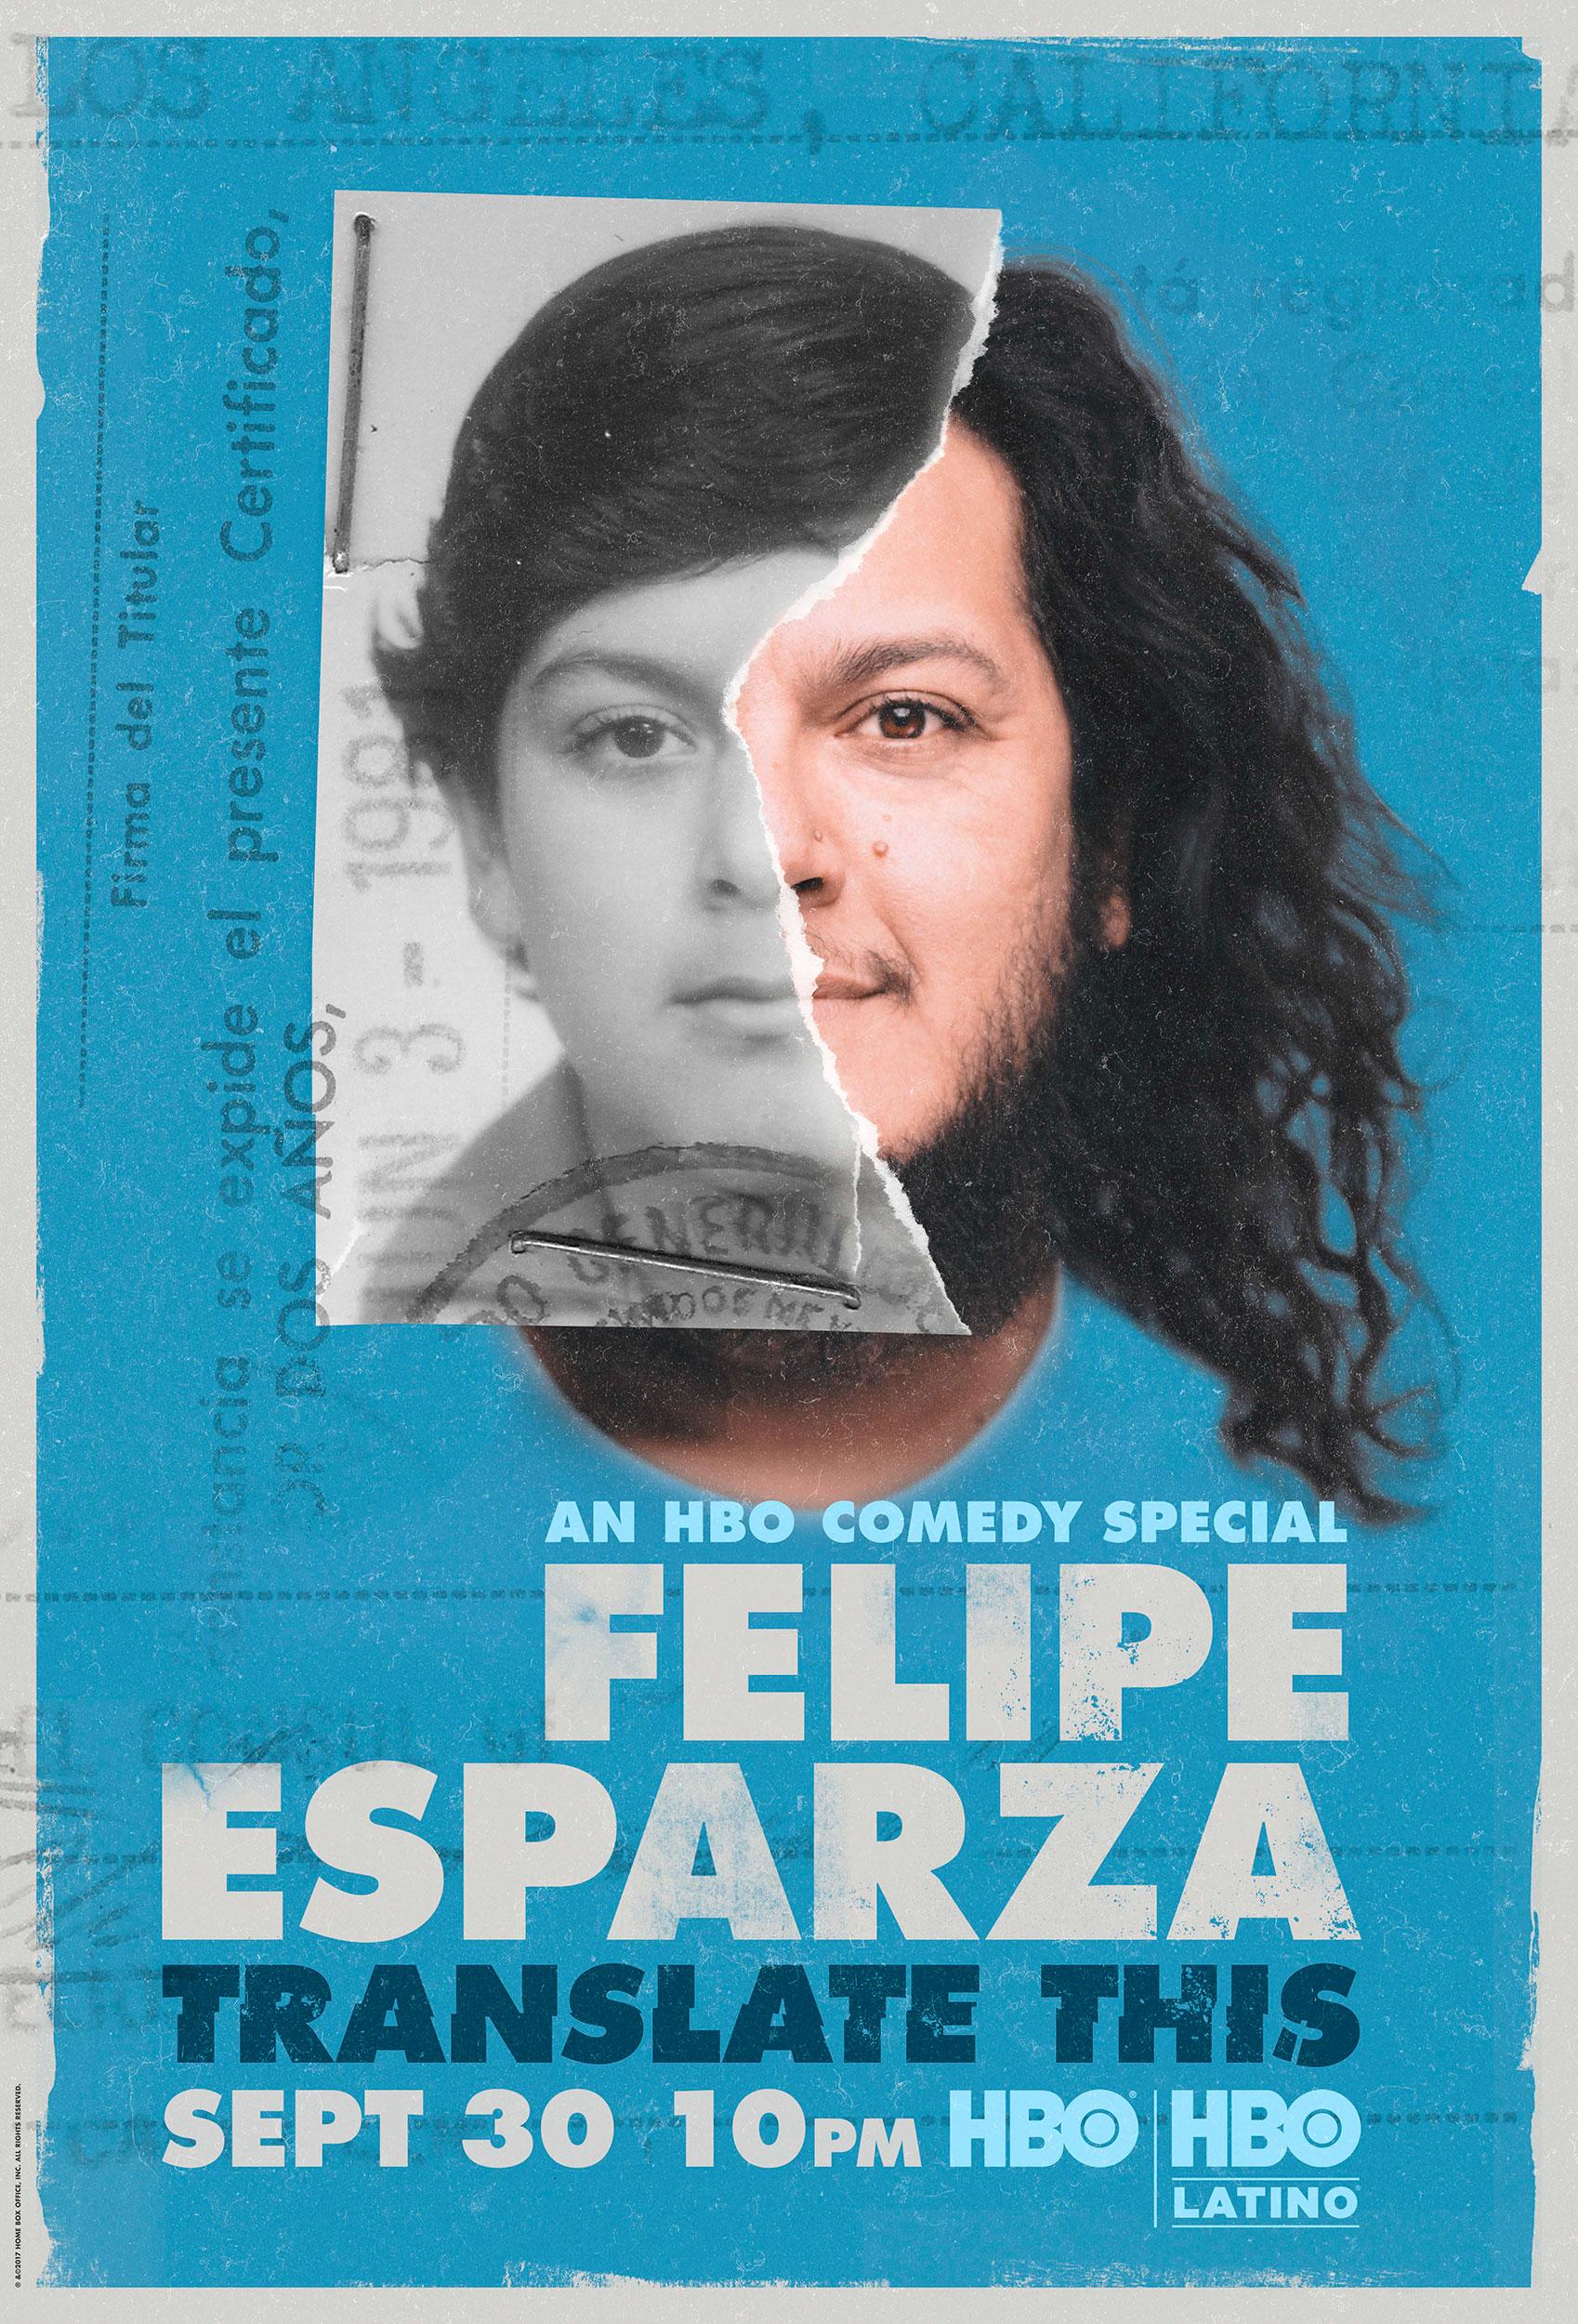 Felipe-Esparza-HBO-Special-Translate-This-Photo-Poster-Design-Juan-Luis-Garcia-2500px.jpg